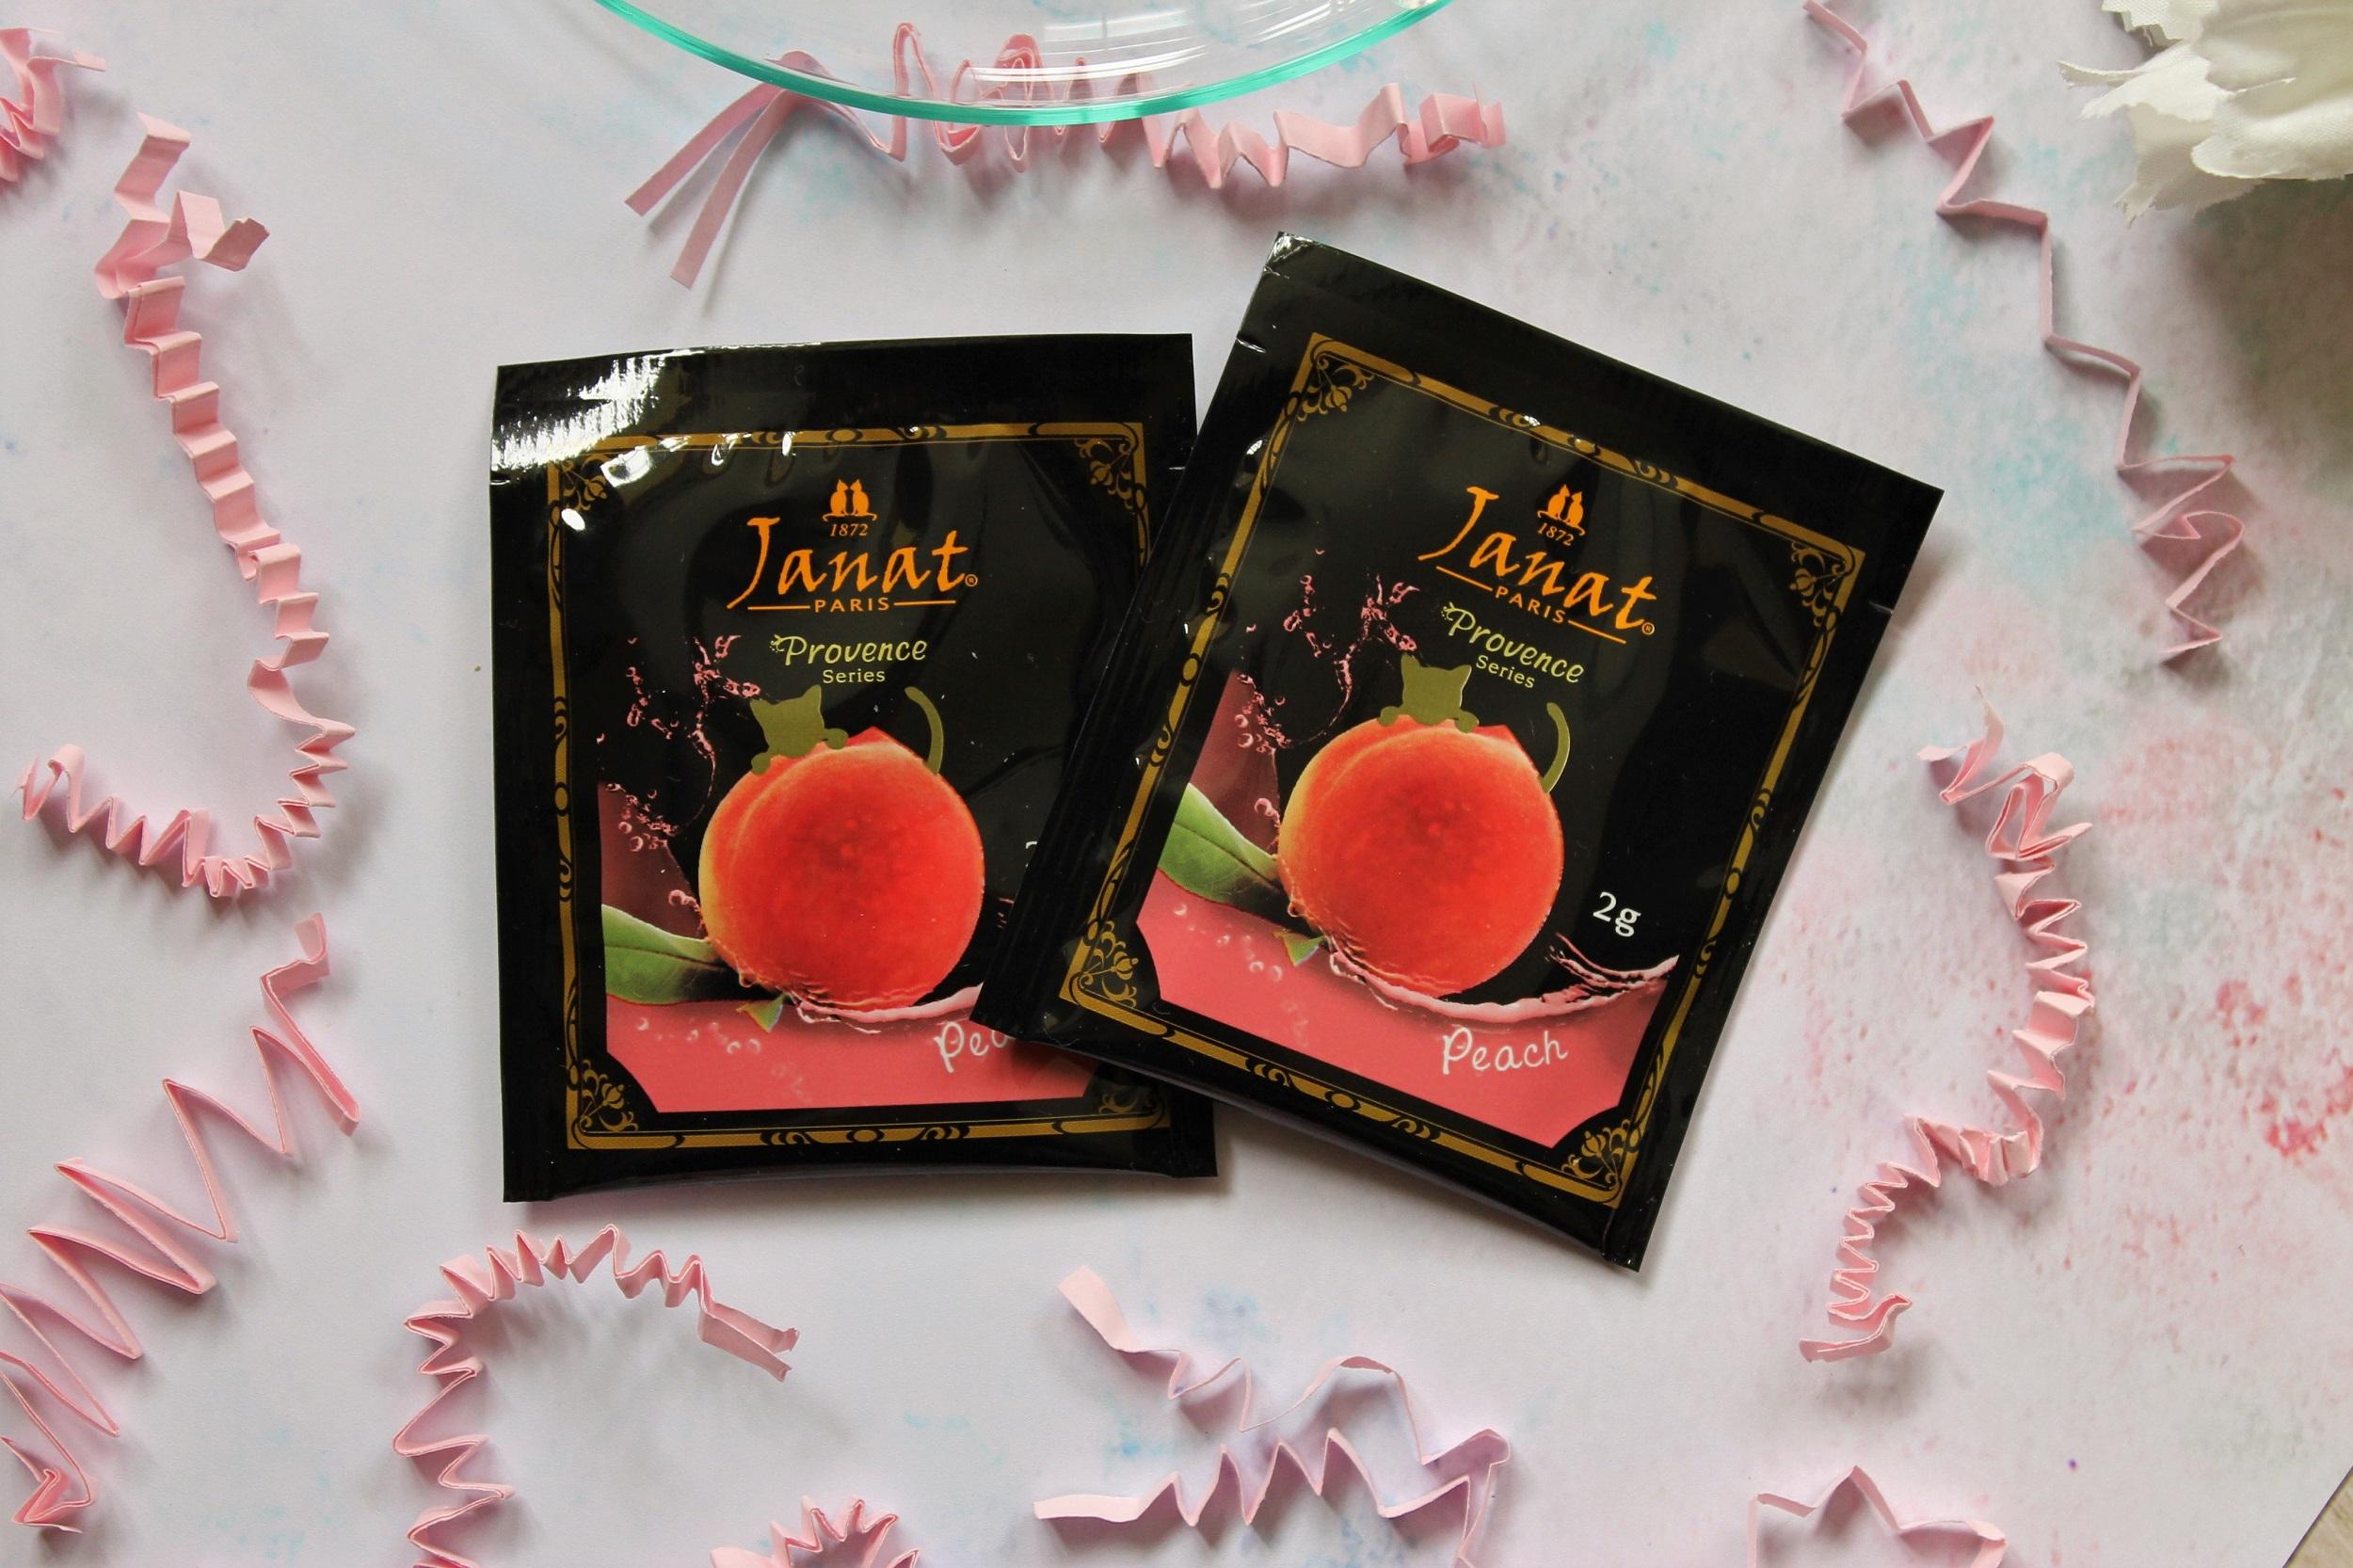 janat peach tea bags